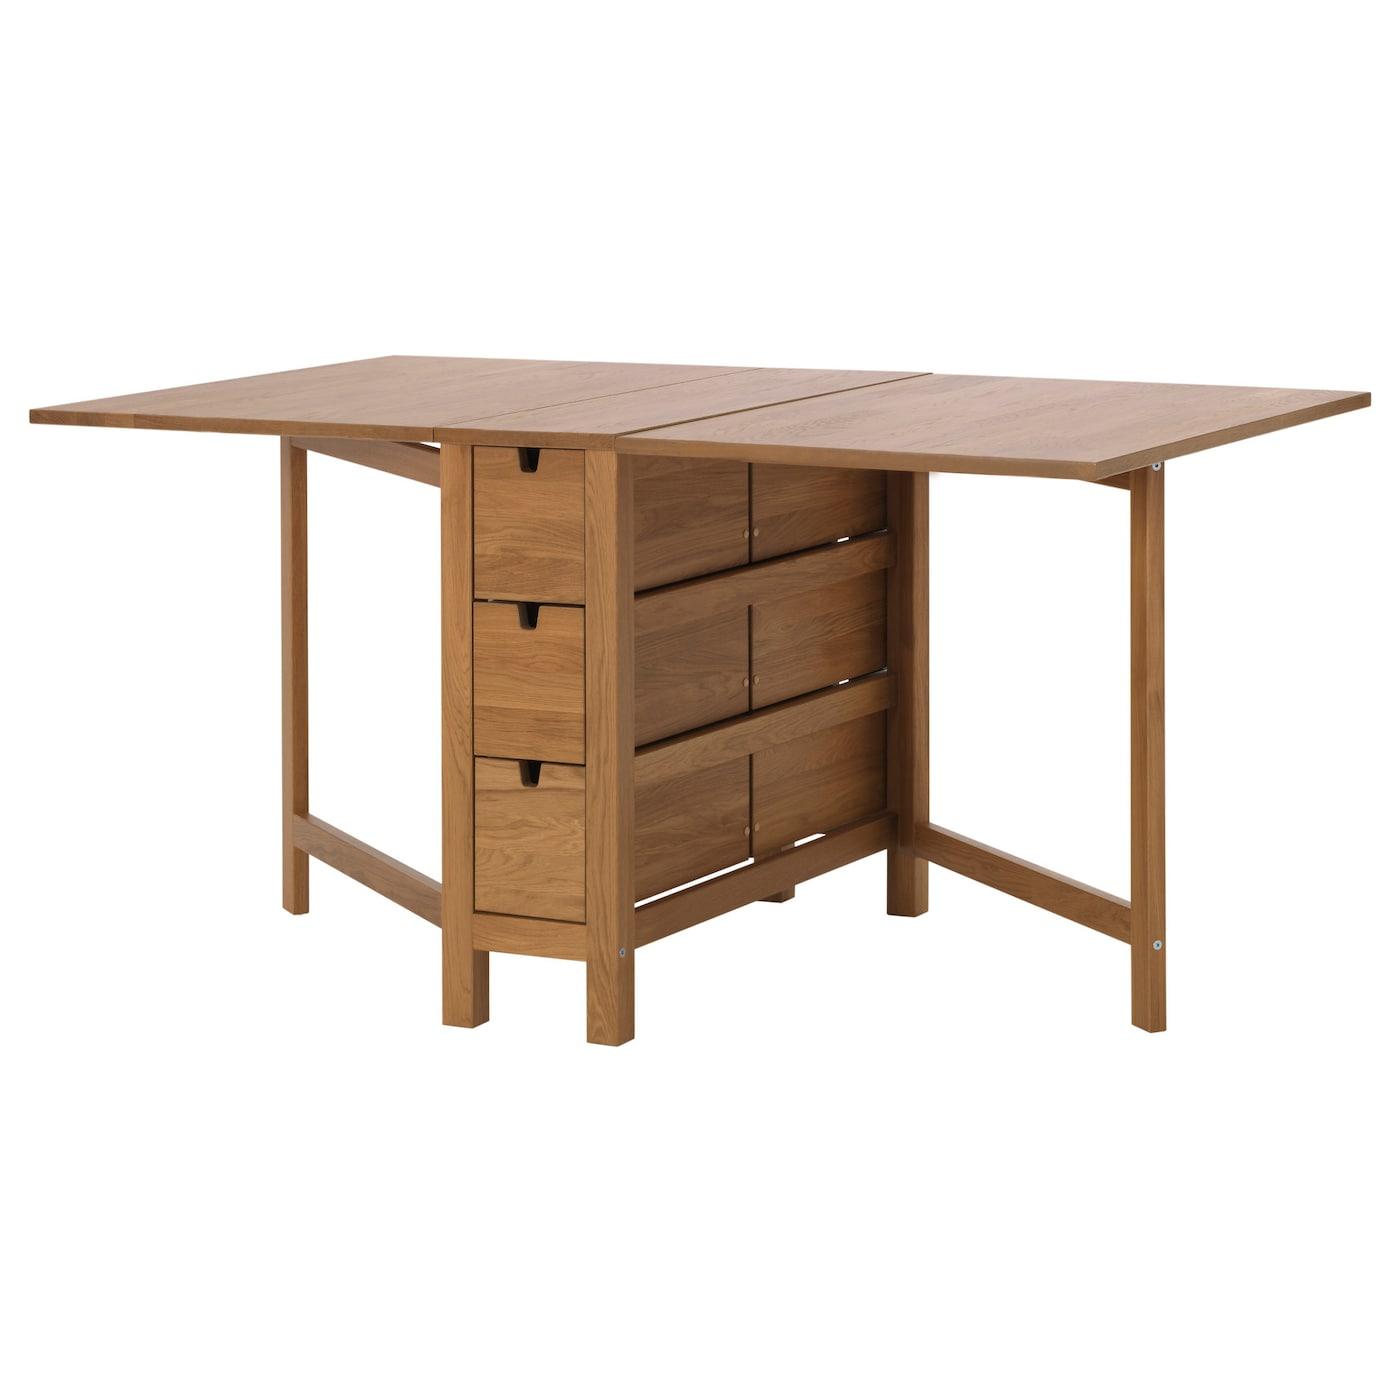 Norden gateleg table oak 26 89 152x80 cm ikea for Table norden ikea